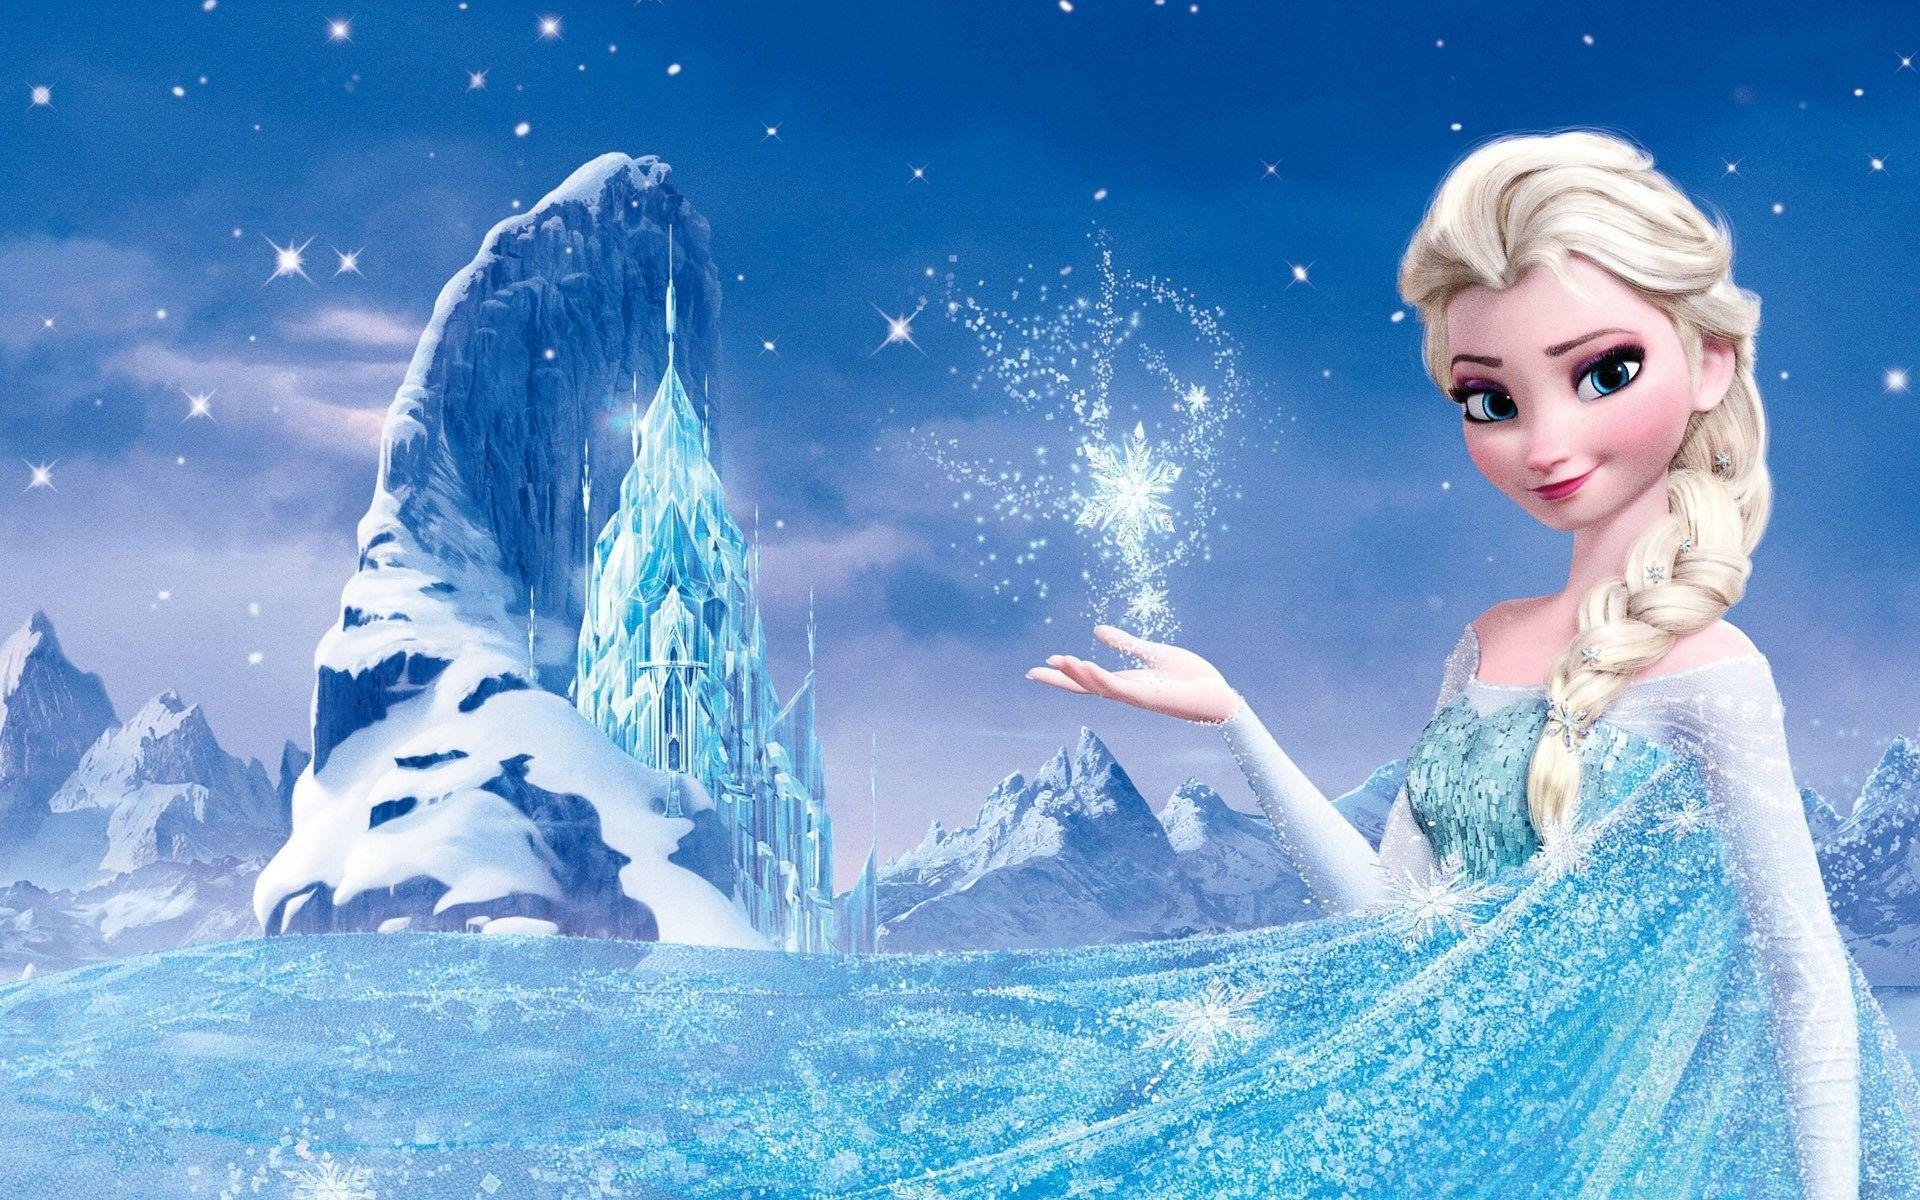 Elsa Frozen Wallpapers Top Free Elsa Frozen Backgrounds Wallpaperaccess